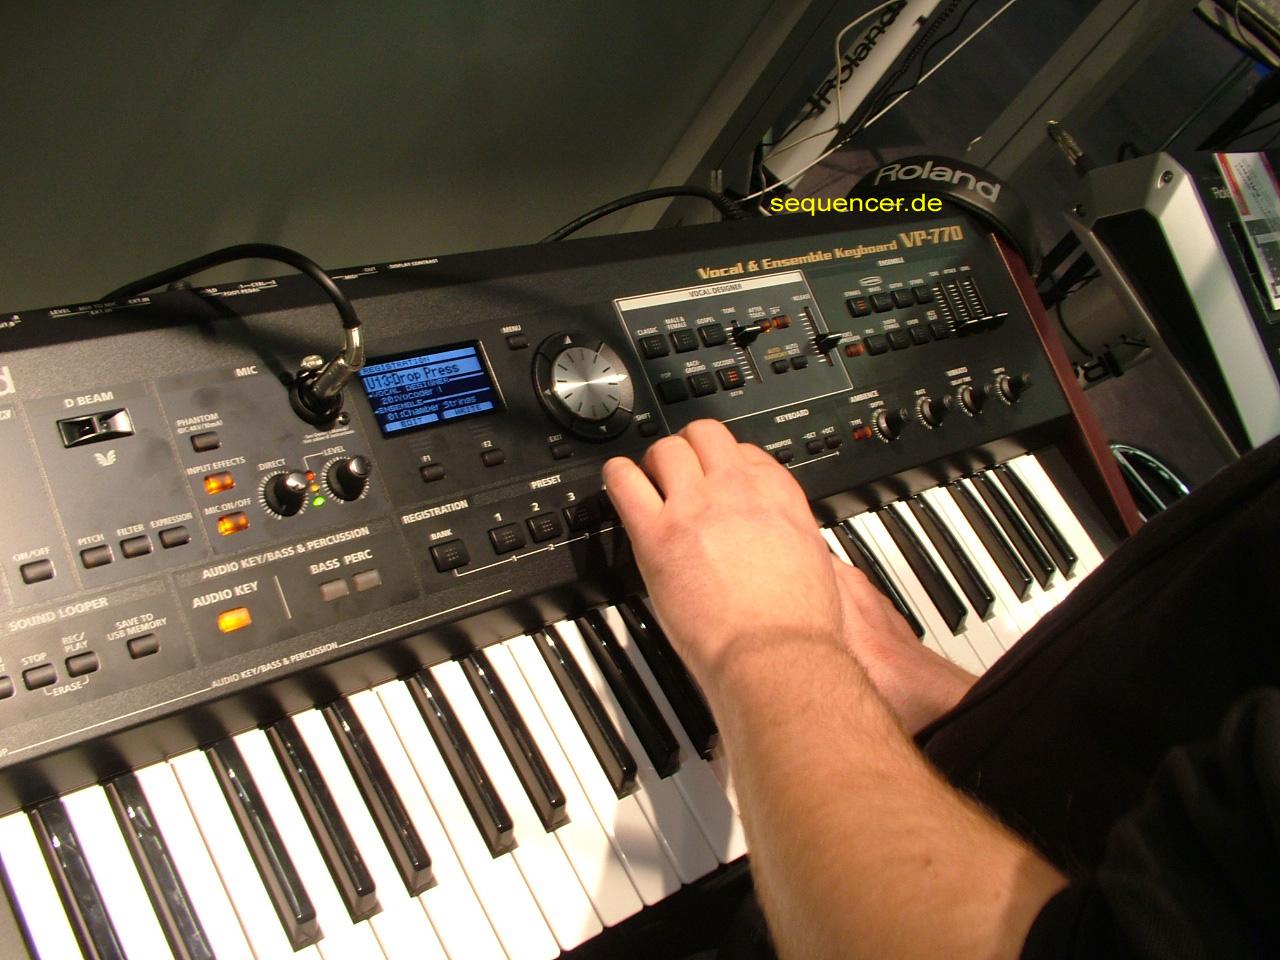 Roland VP-770 Vocoder / Harmonizer Roland VP-770 Vocoder / Harmonizer synthesizer